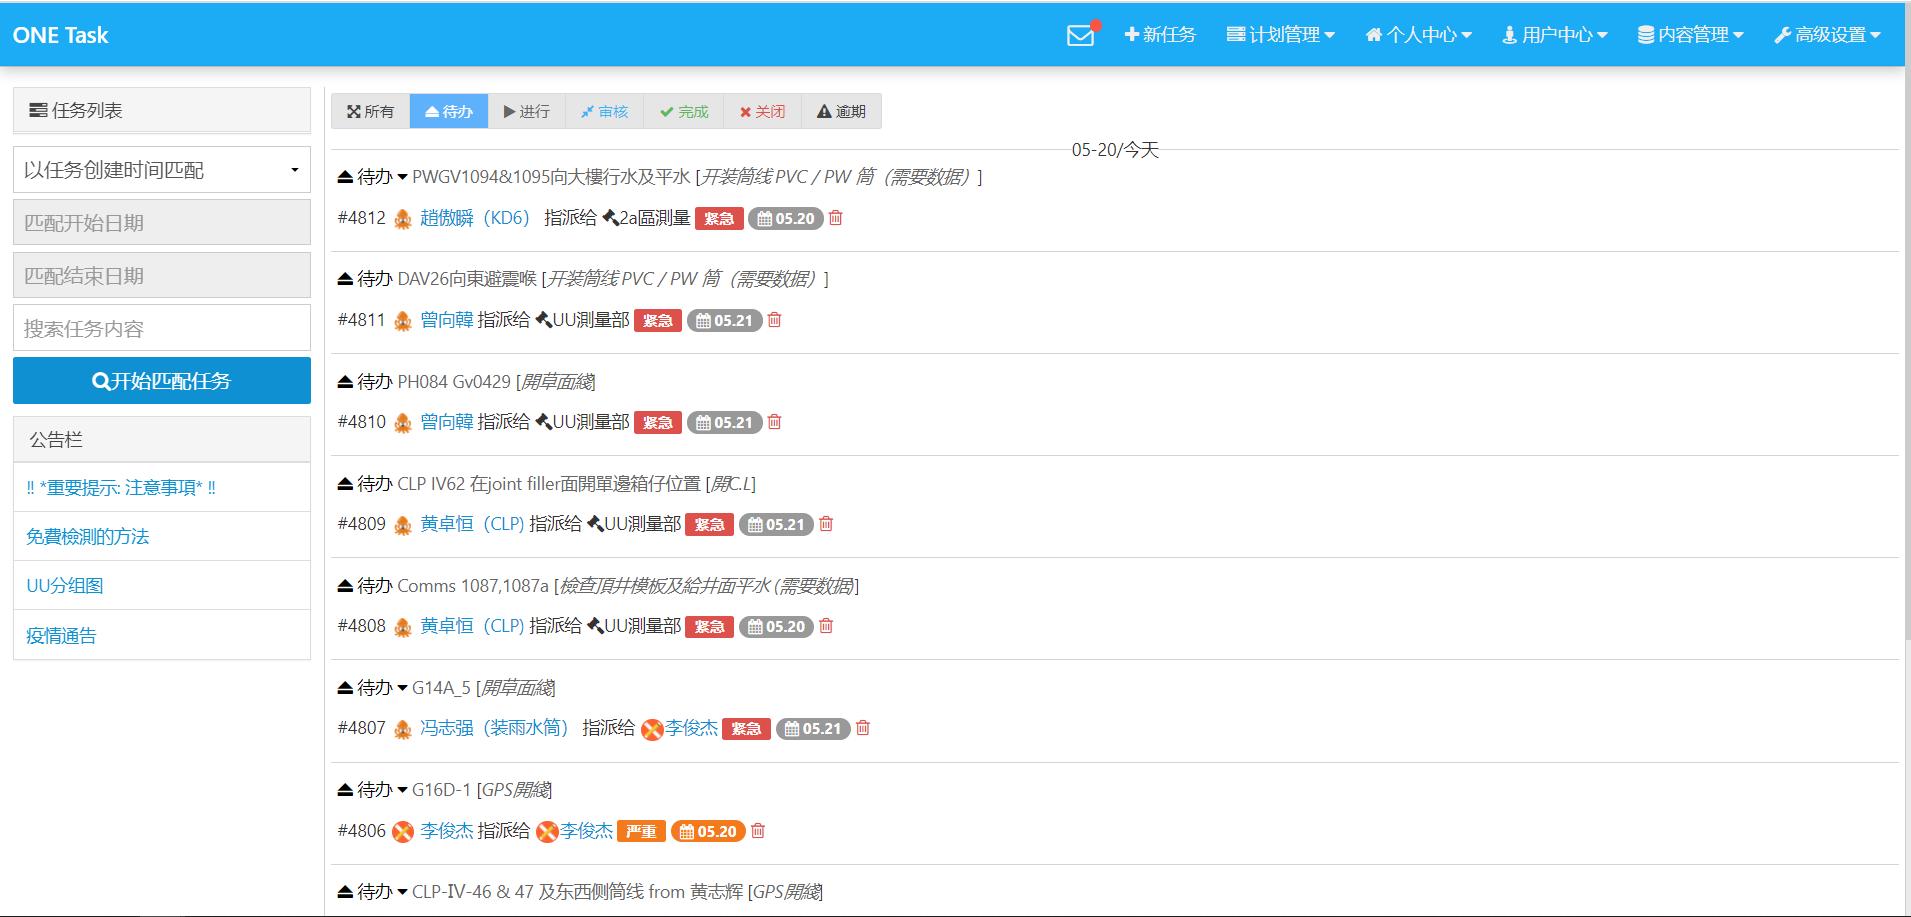 php团队任务管理系统搭建